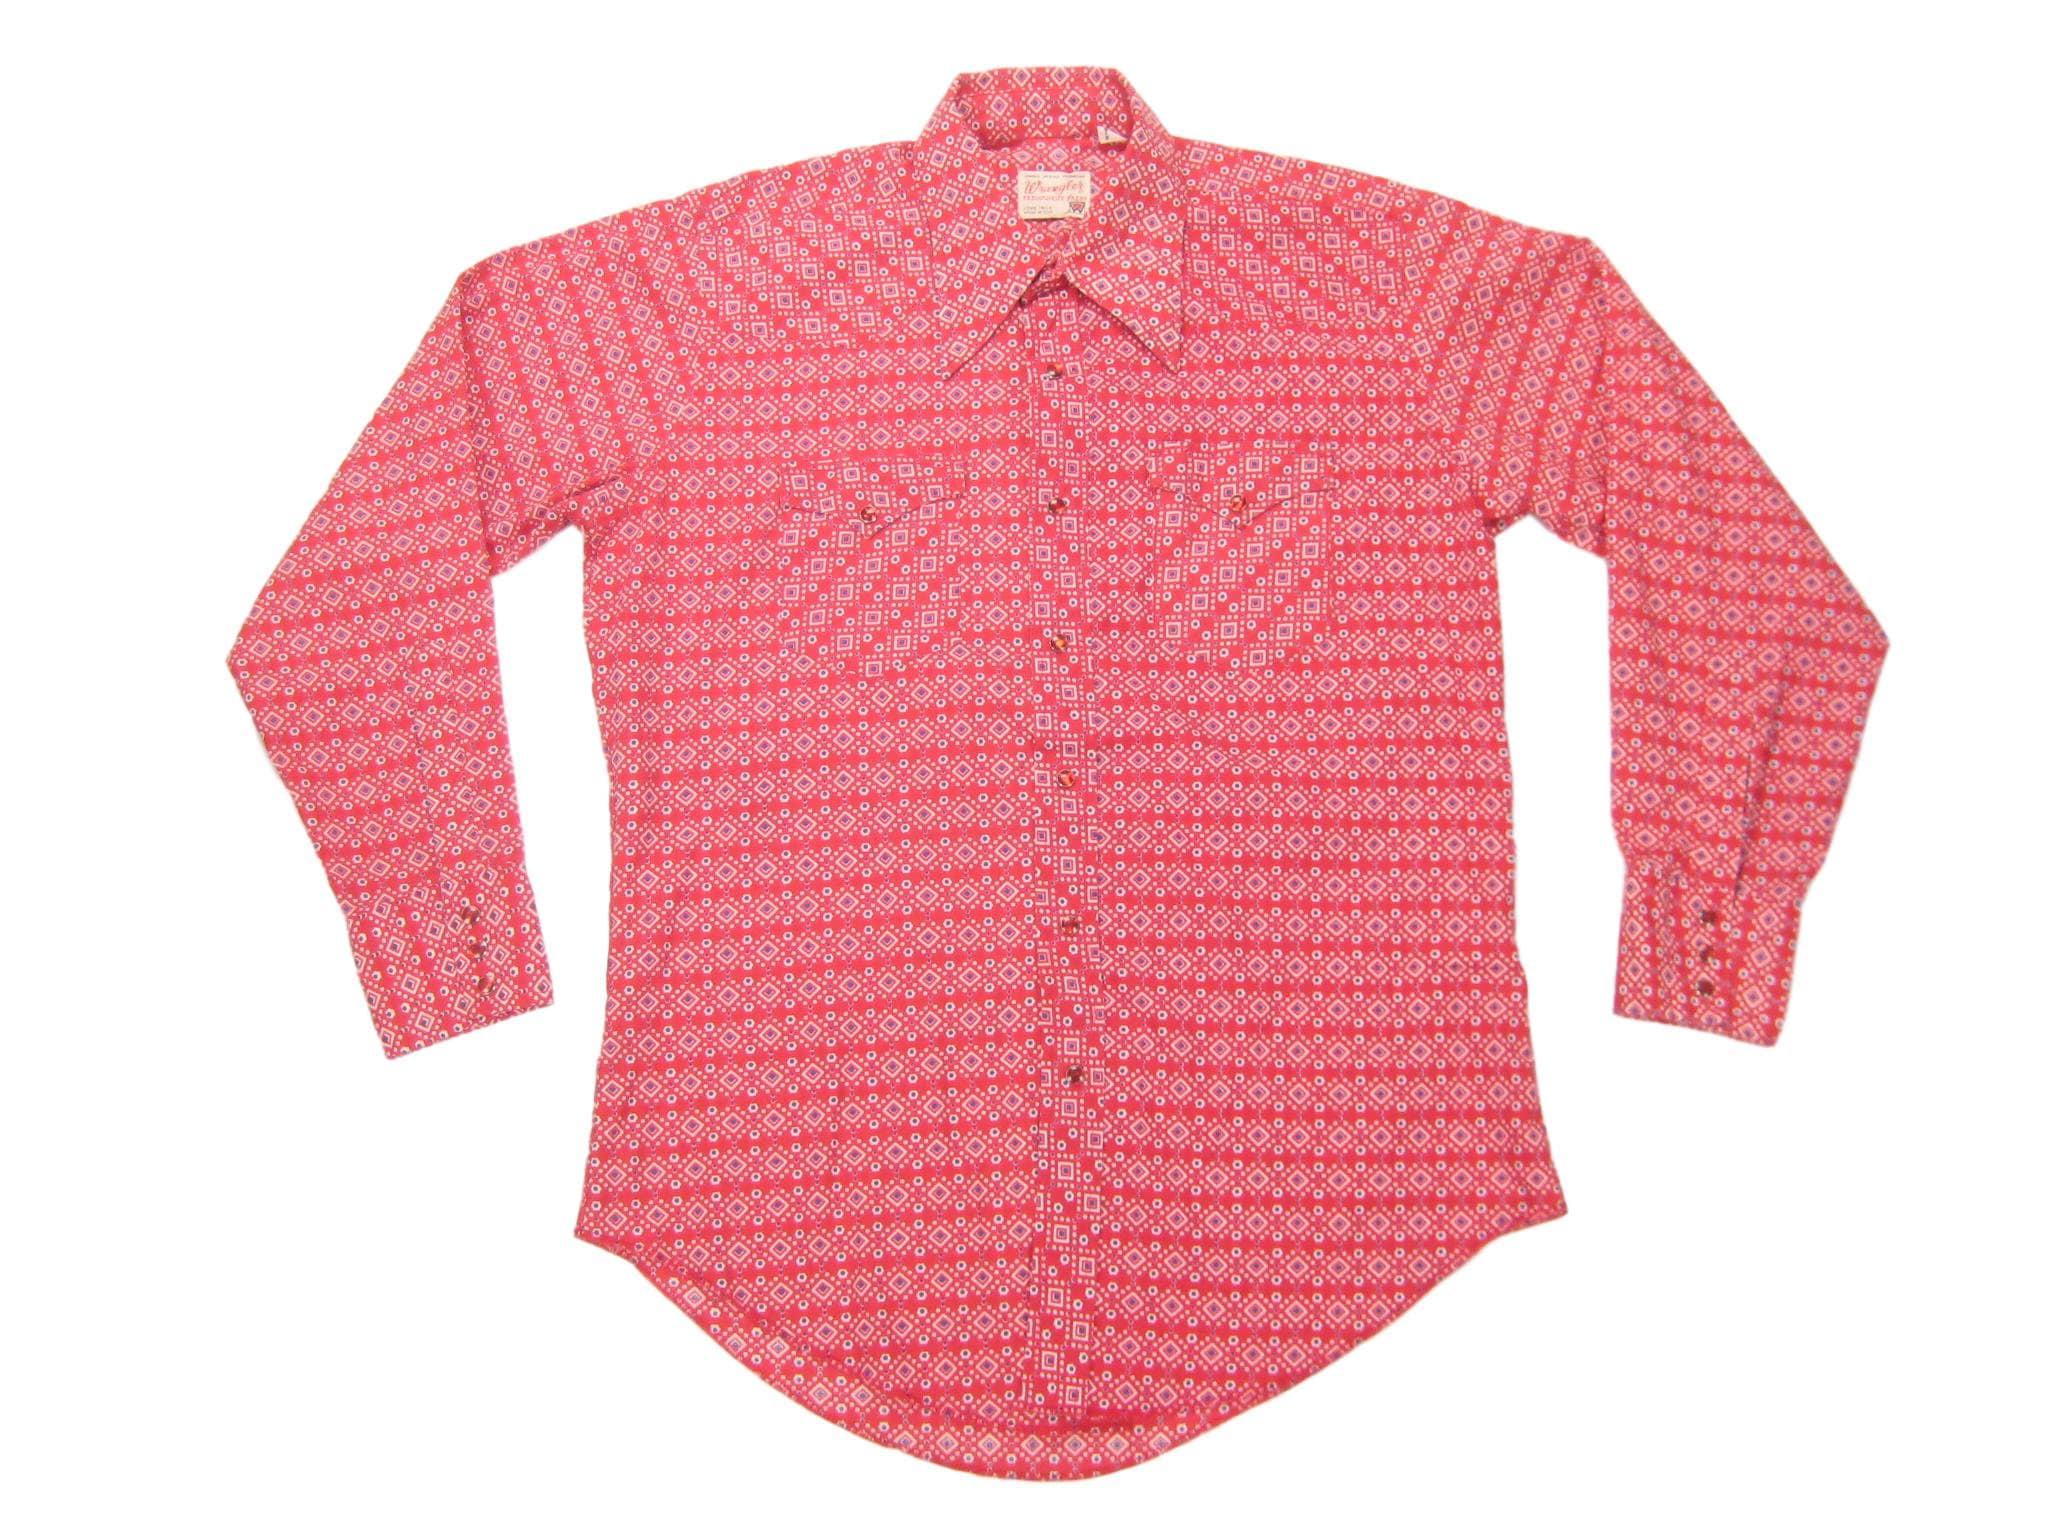 1970s Men's Shirt Styles – Vintage 70s Shirts for Guys 1960S1970S Wrangler Print Western Shirt Vintage Retro Mens Pearl Snap Hippie Cowboy Bandanna Ranch Long Sleeve Size 16 12 - 34 LLargexl $65.00 AT vintagedancer.com